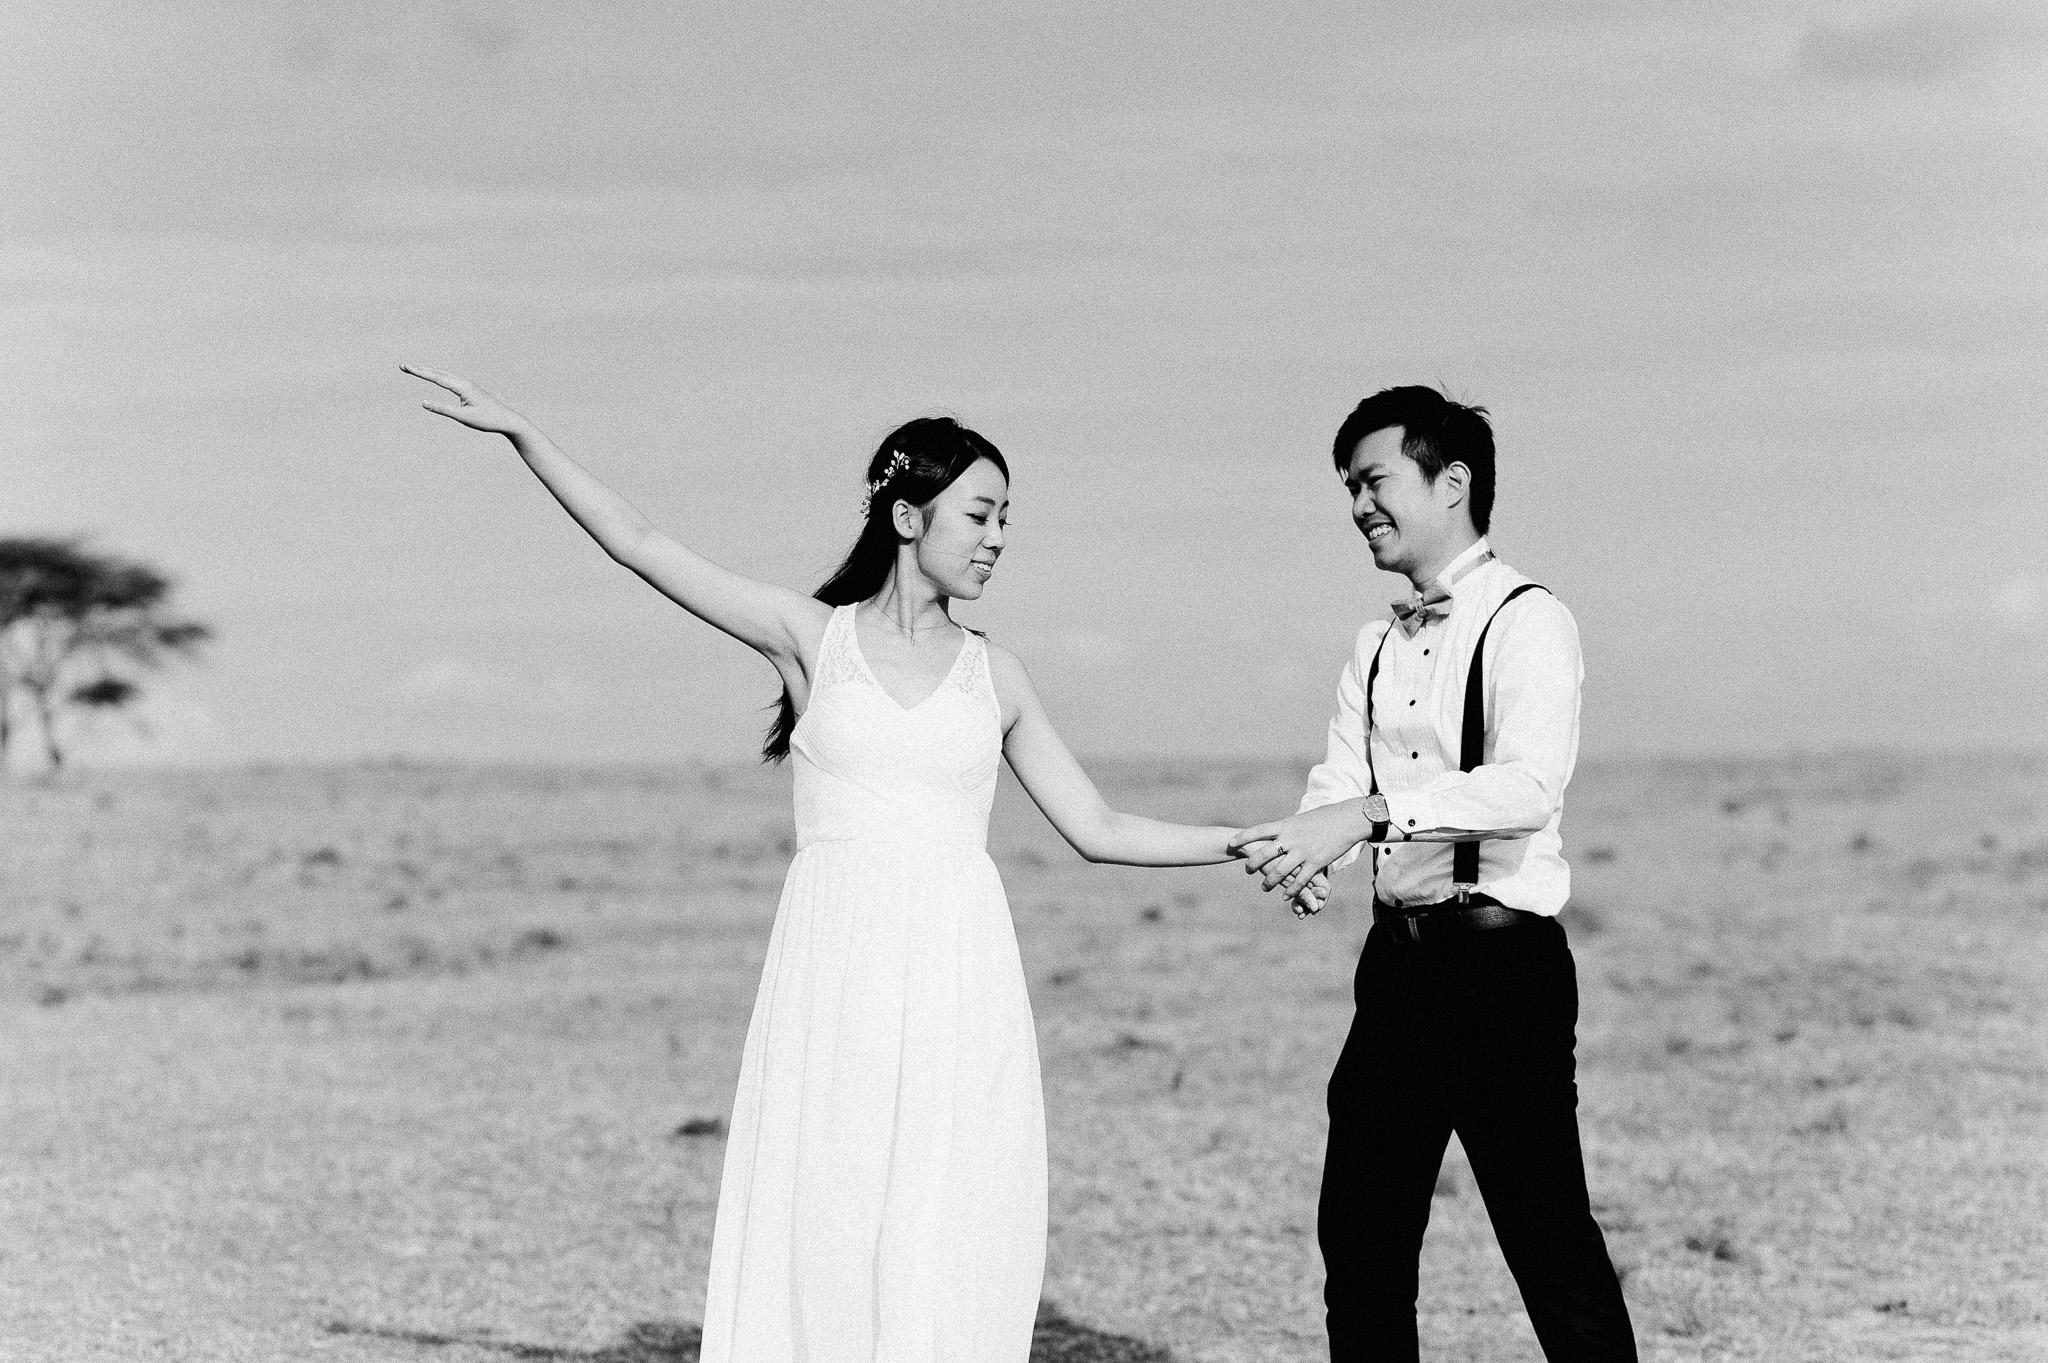 Anna-Hari-Photography-Safari-Elopement-Kenya-Wedding-Photographer-Kenya-49.jpg